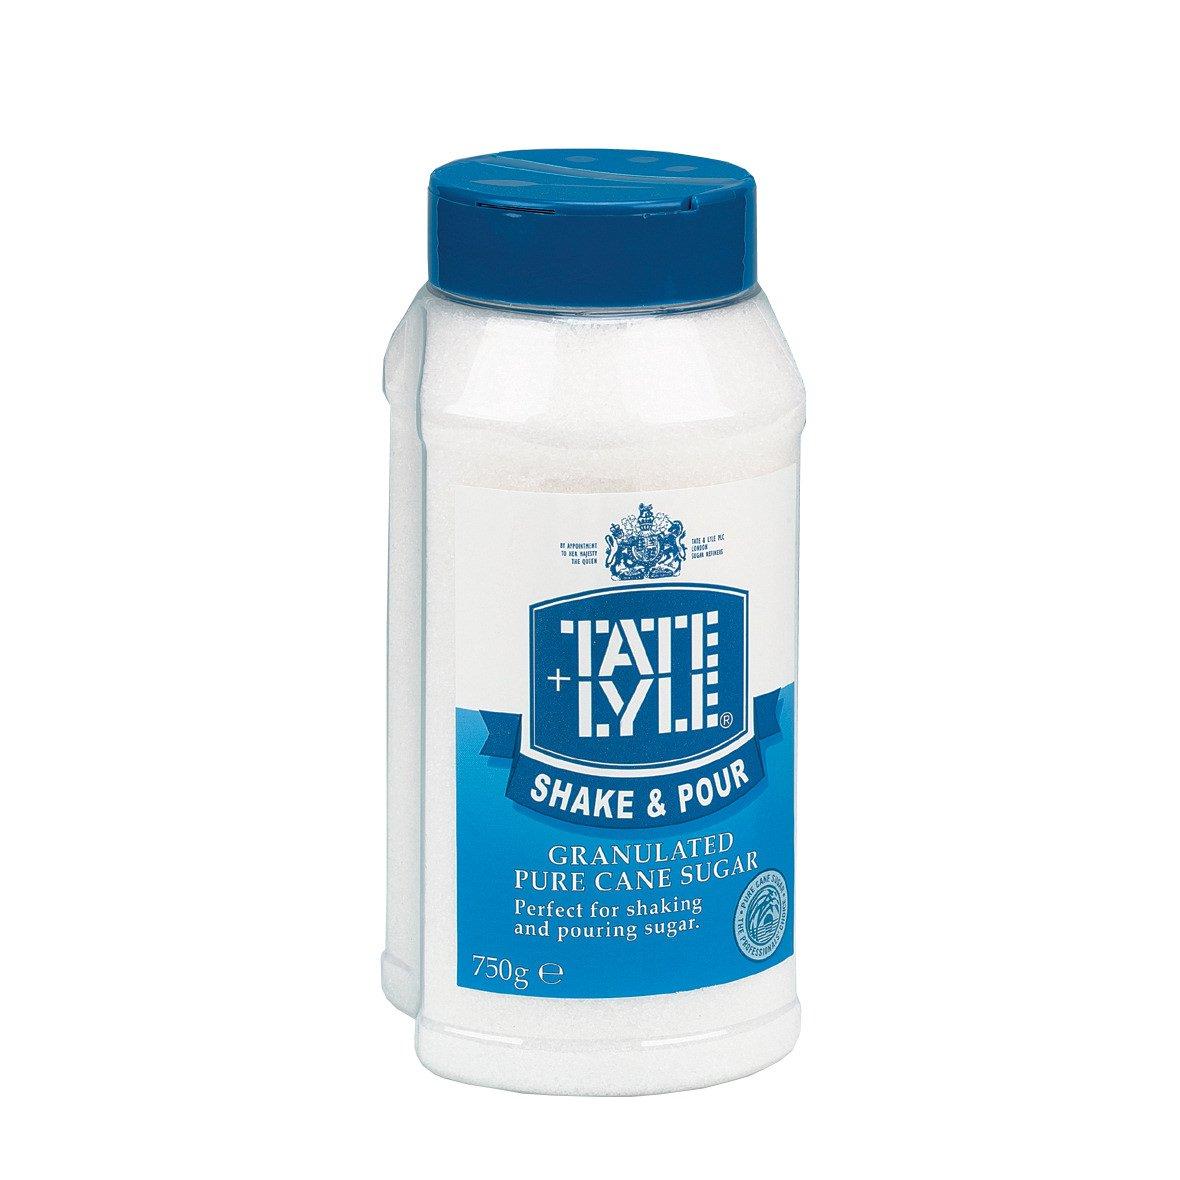 Tate & Lyle Granulated Sugar Tub Dispenser 750g